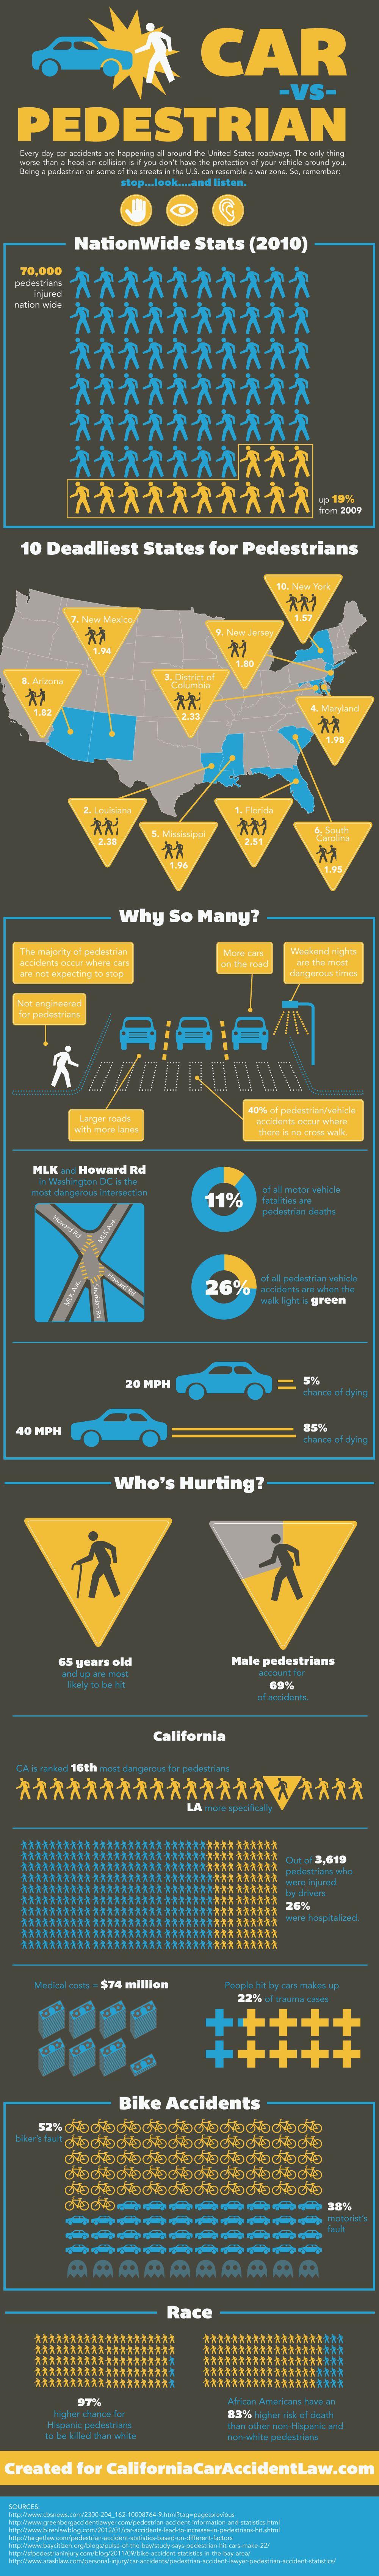 Cars Vs Pedestrians Infographic Pedestrian Urban Design Plan